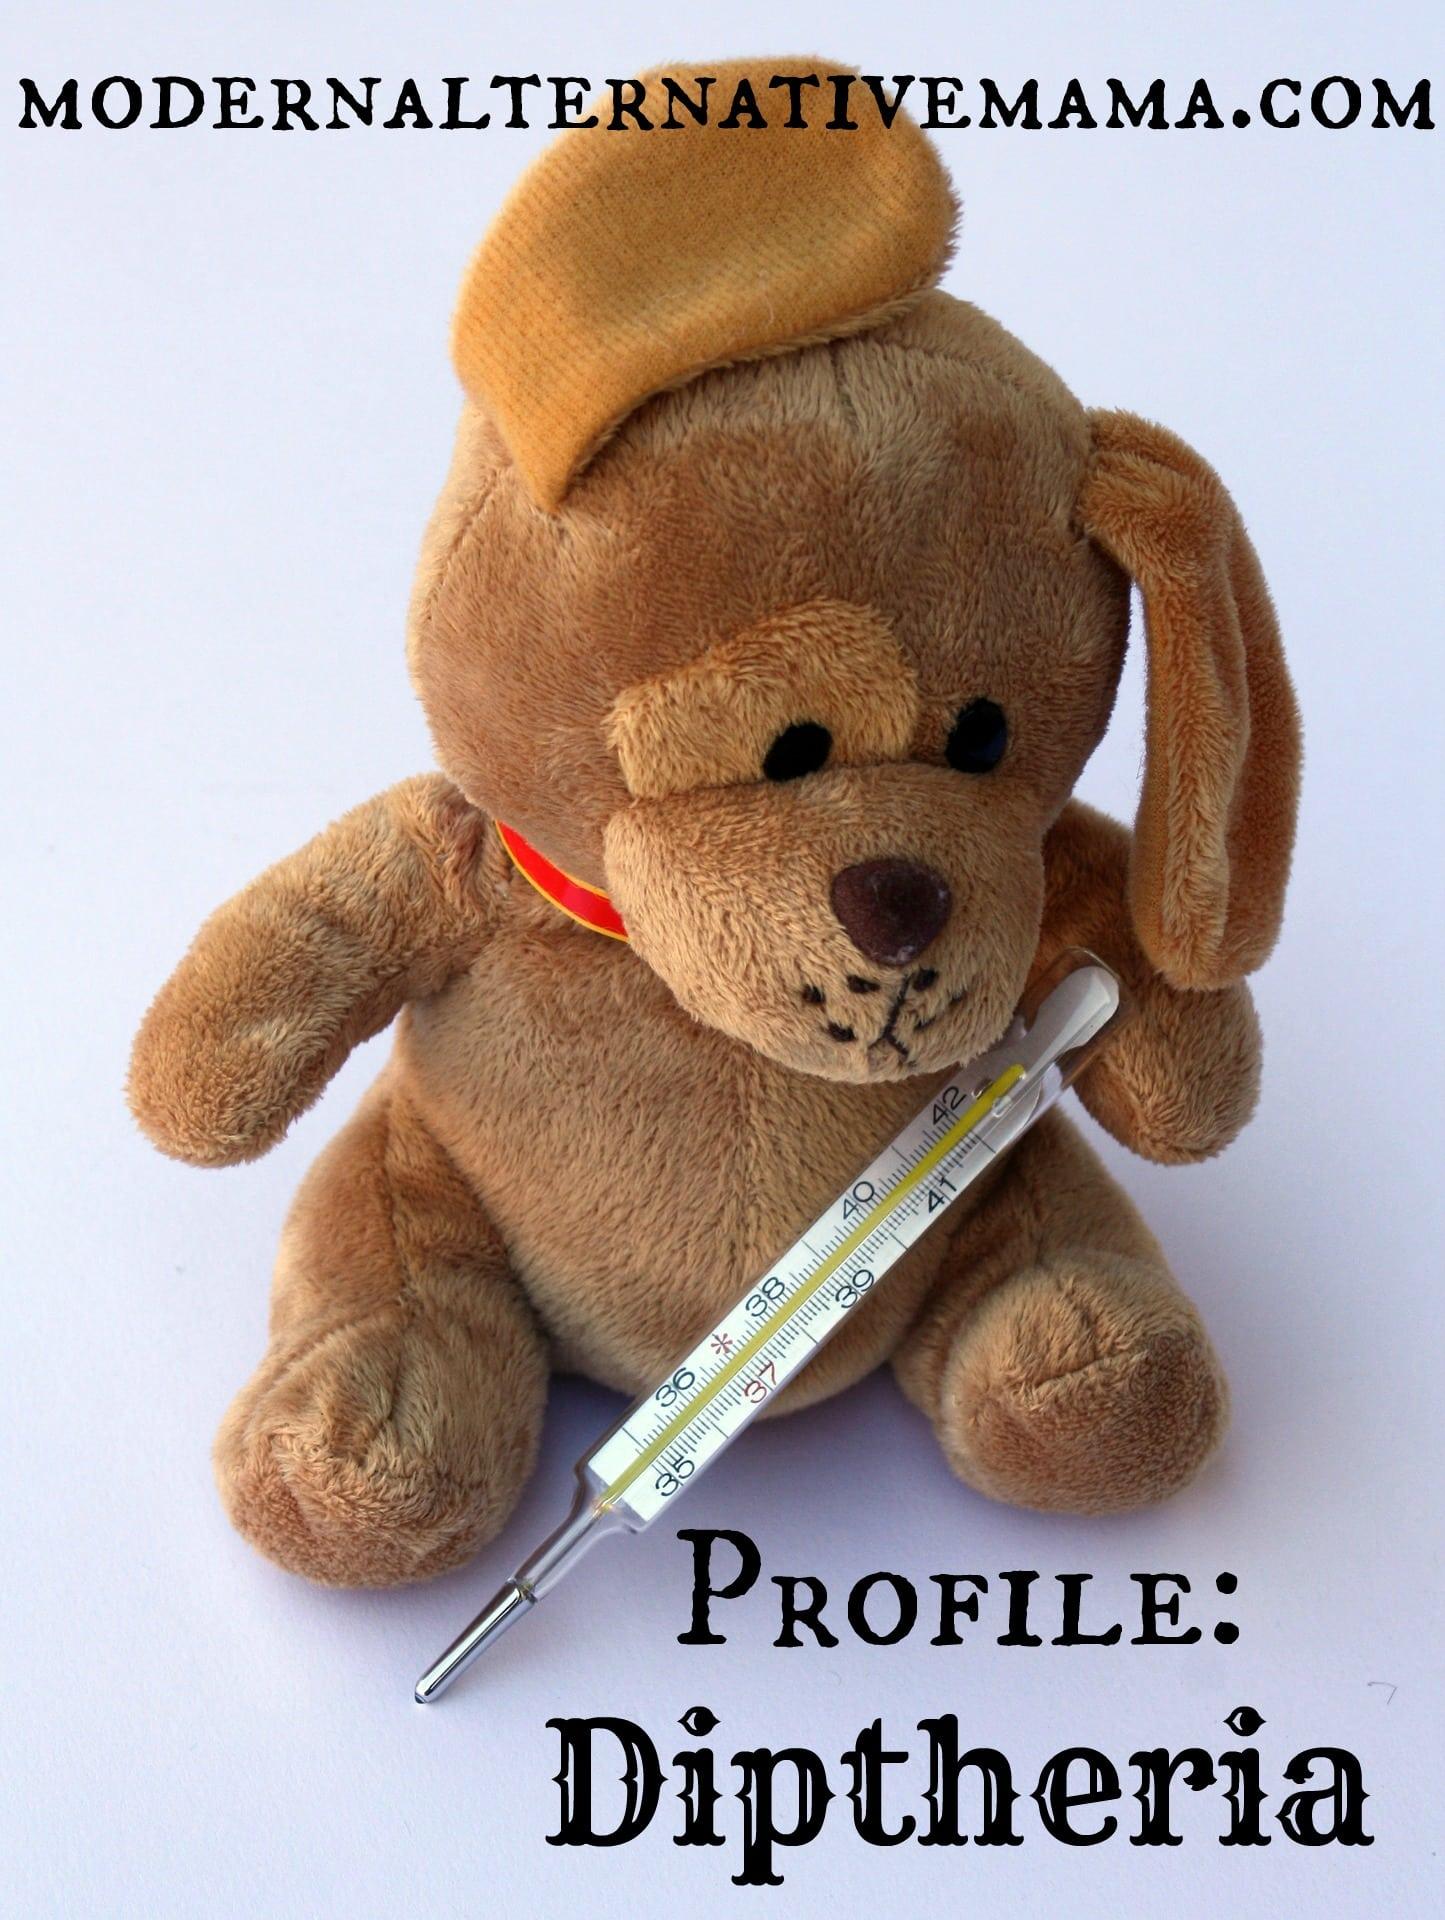 teddy-242868_1920